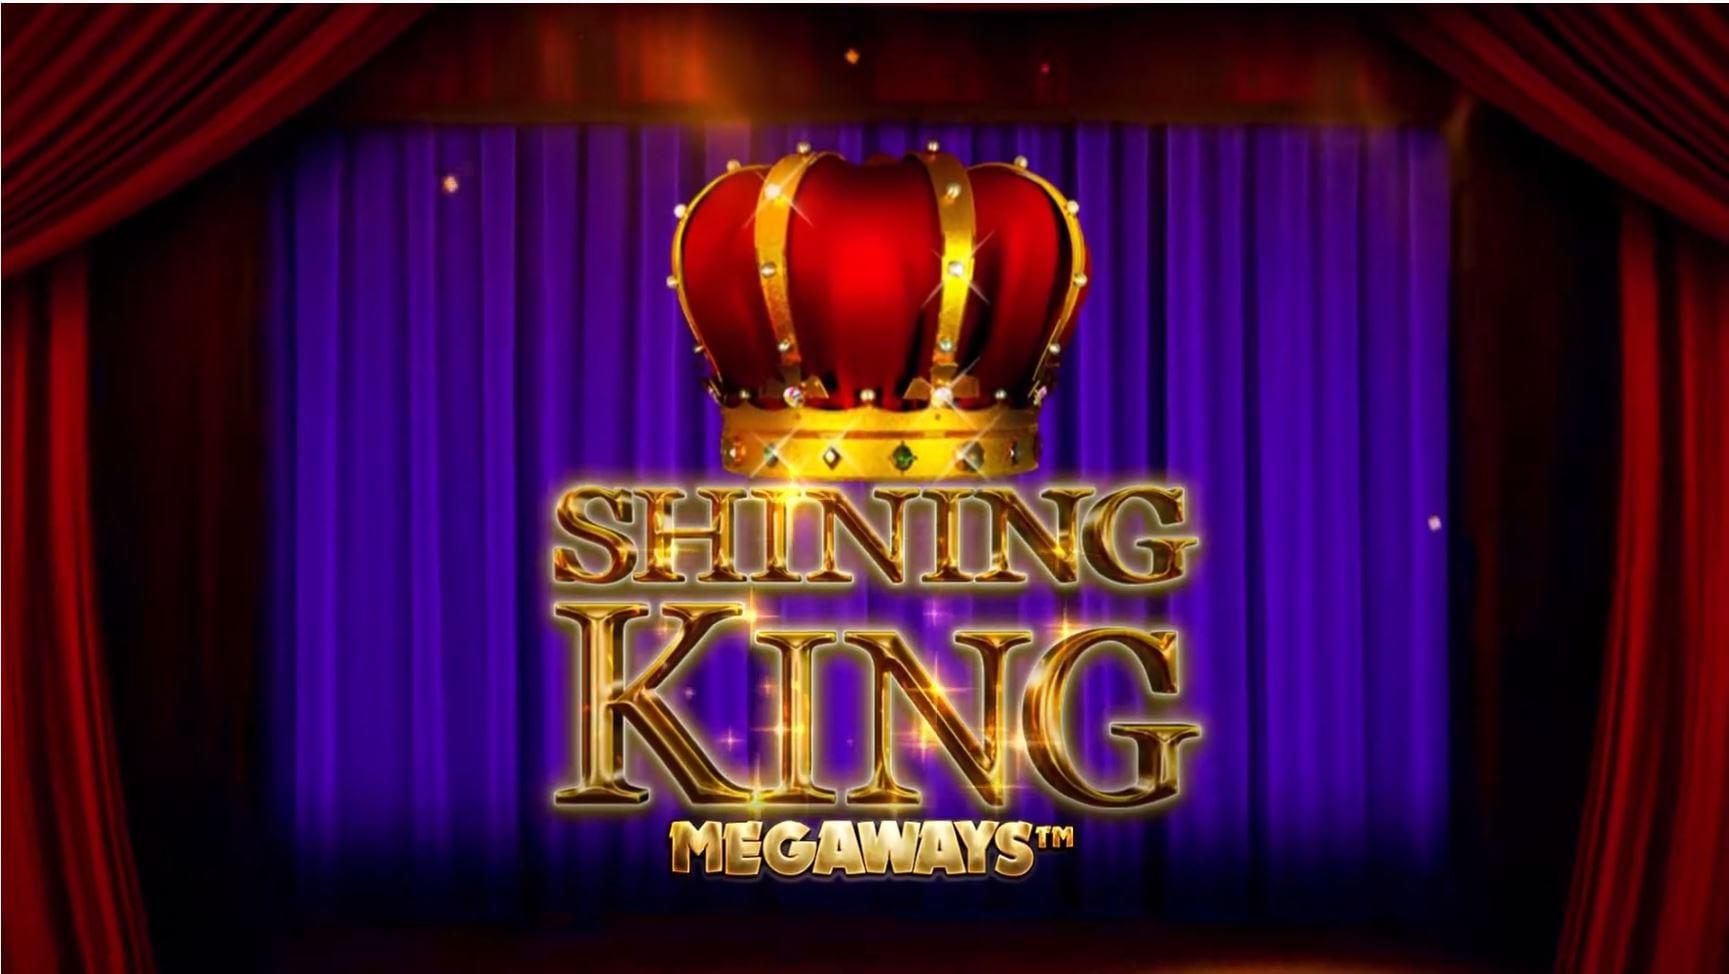 shining kings megaways slot by isoftbet